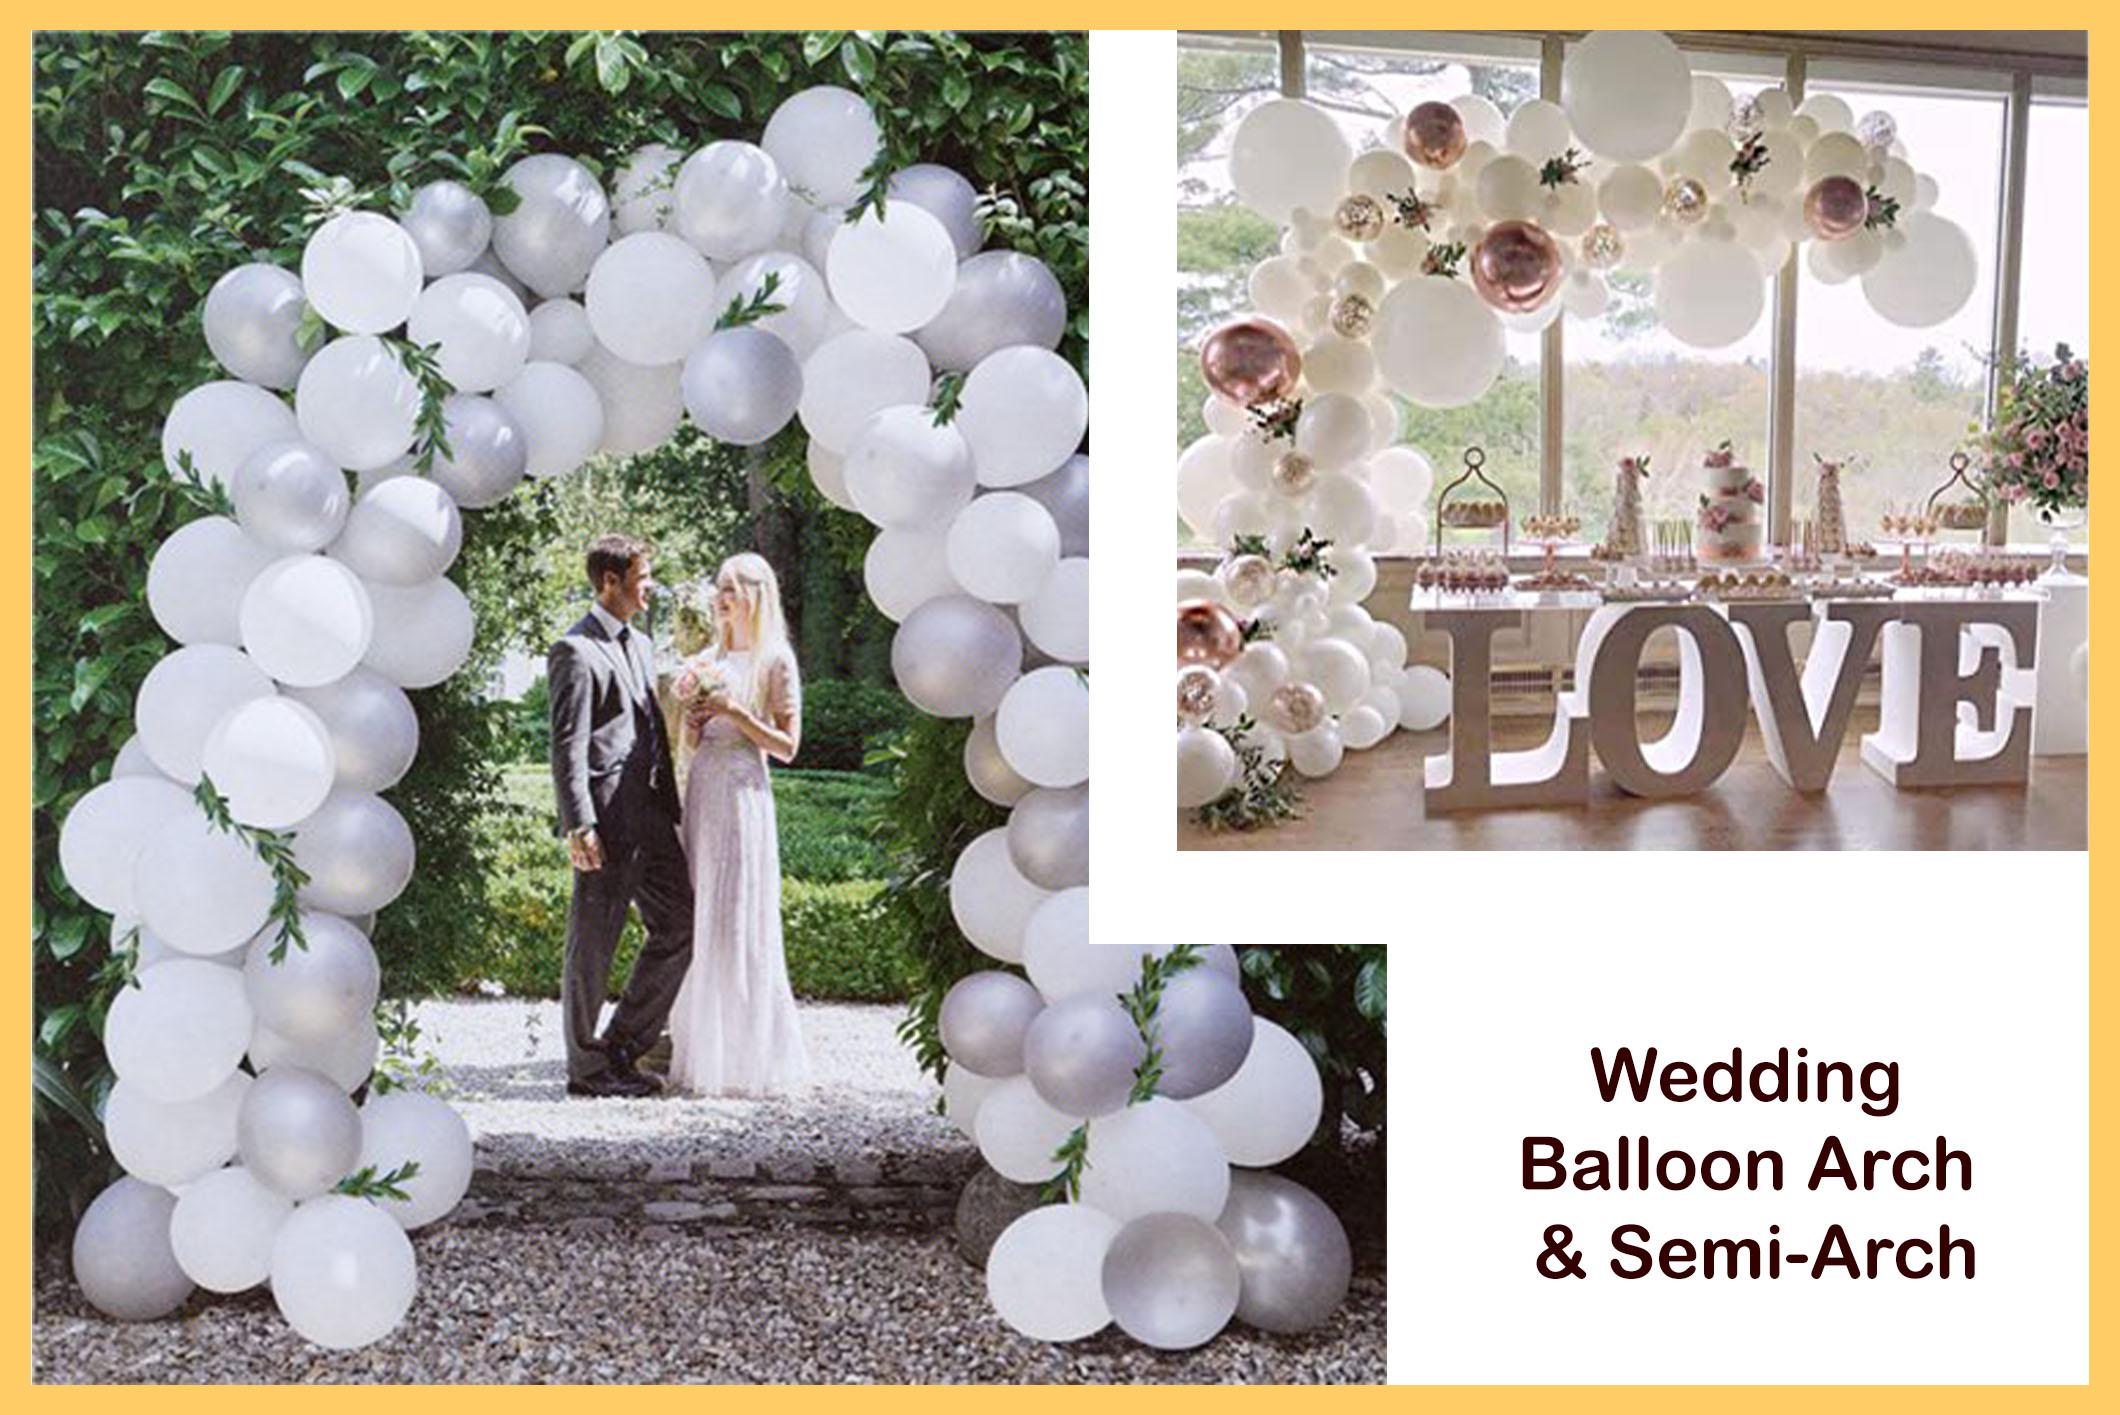 Wedding Props - Balloon Archesjpg